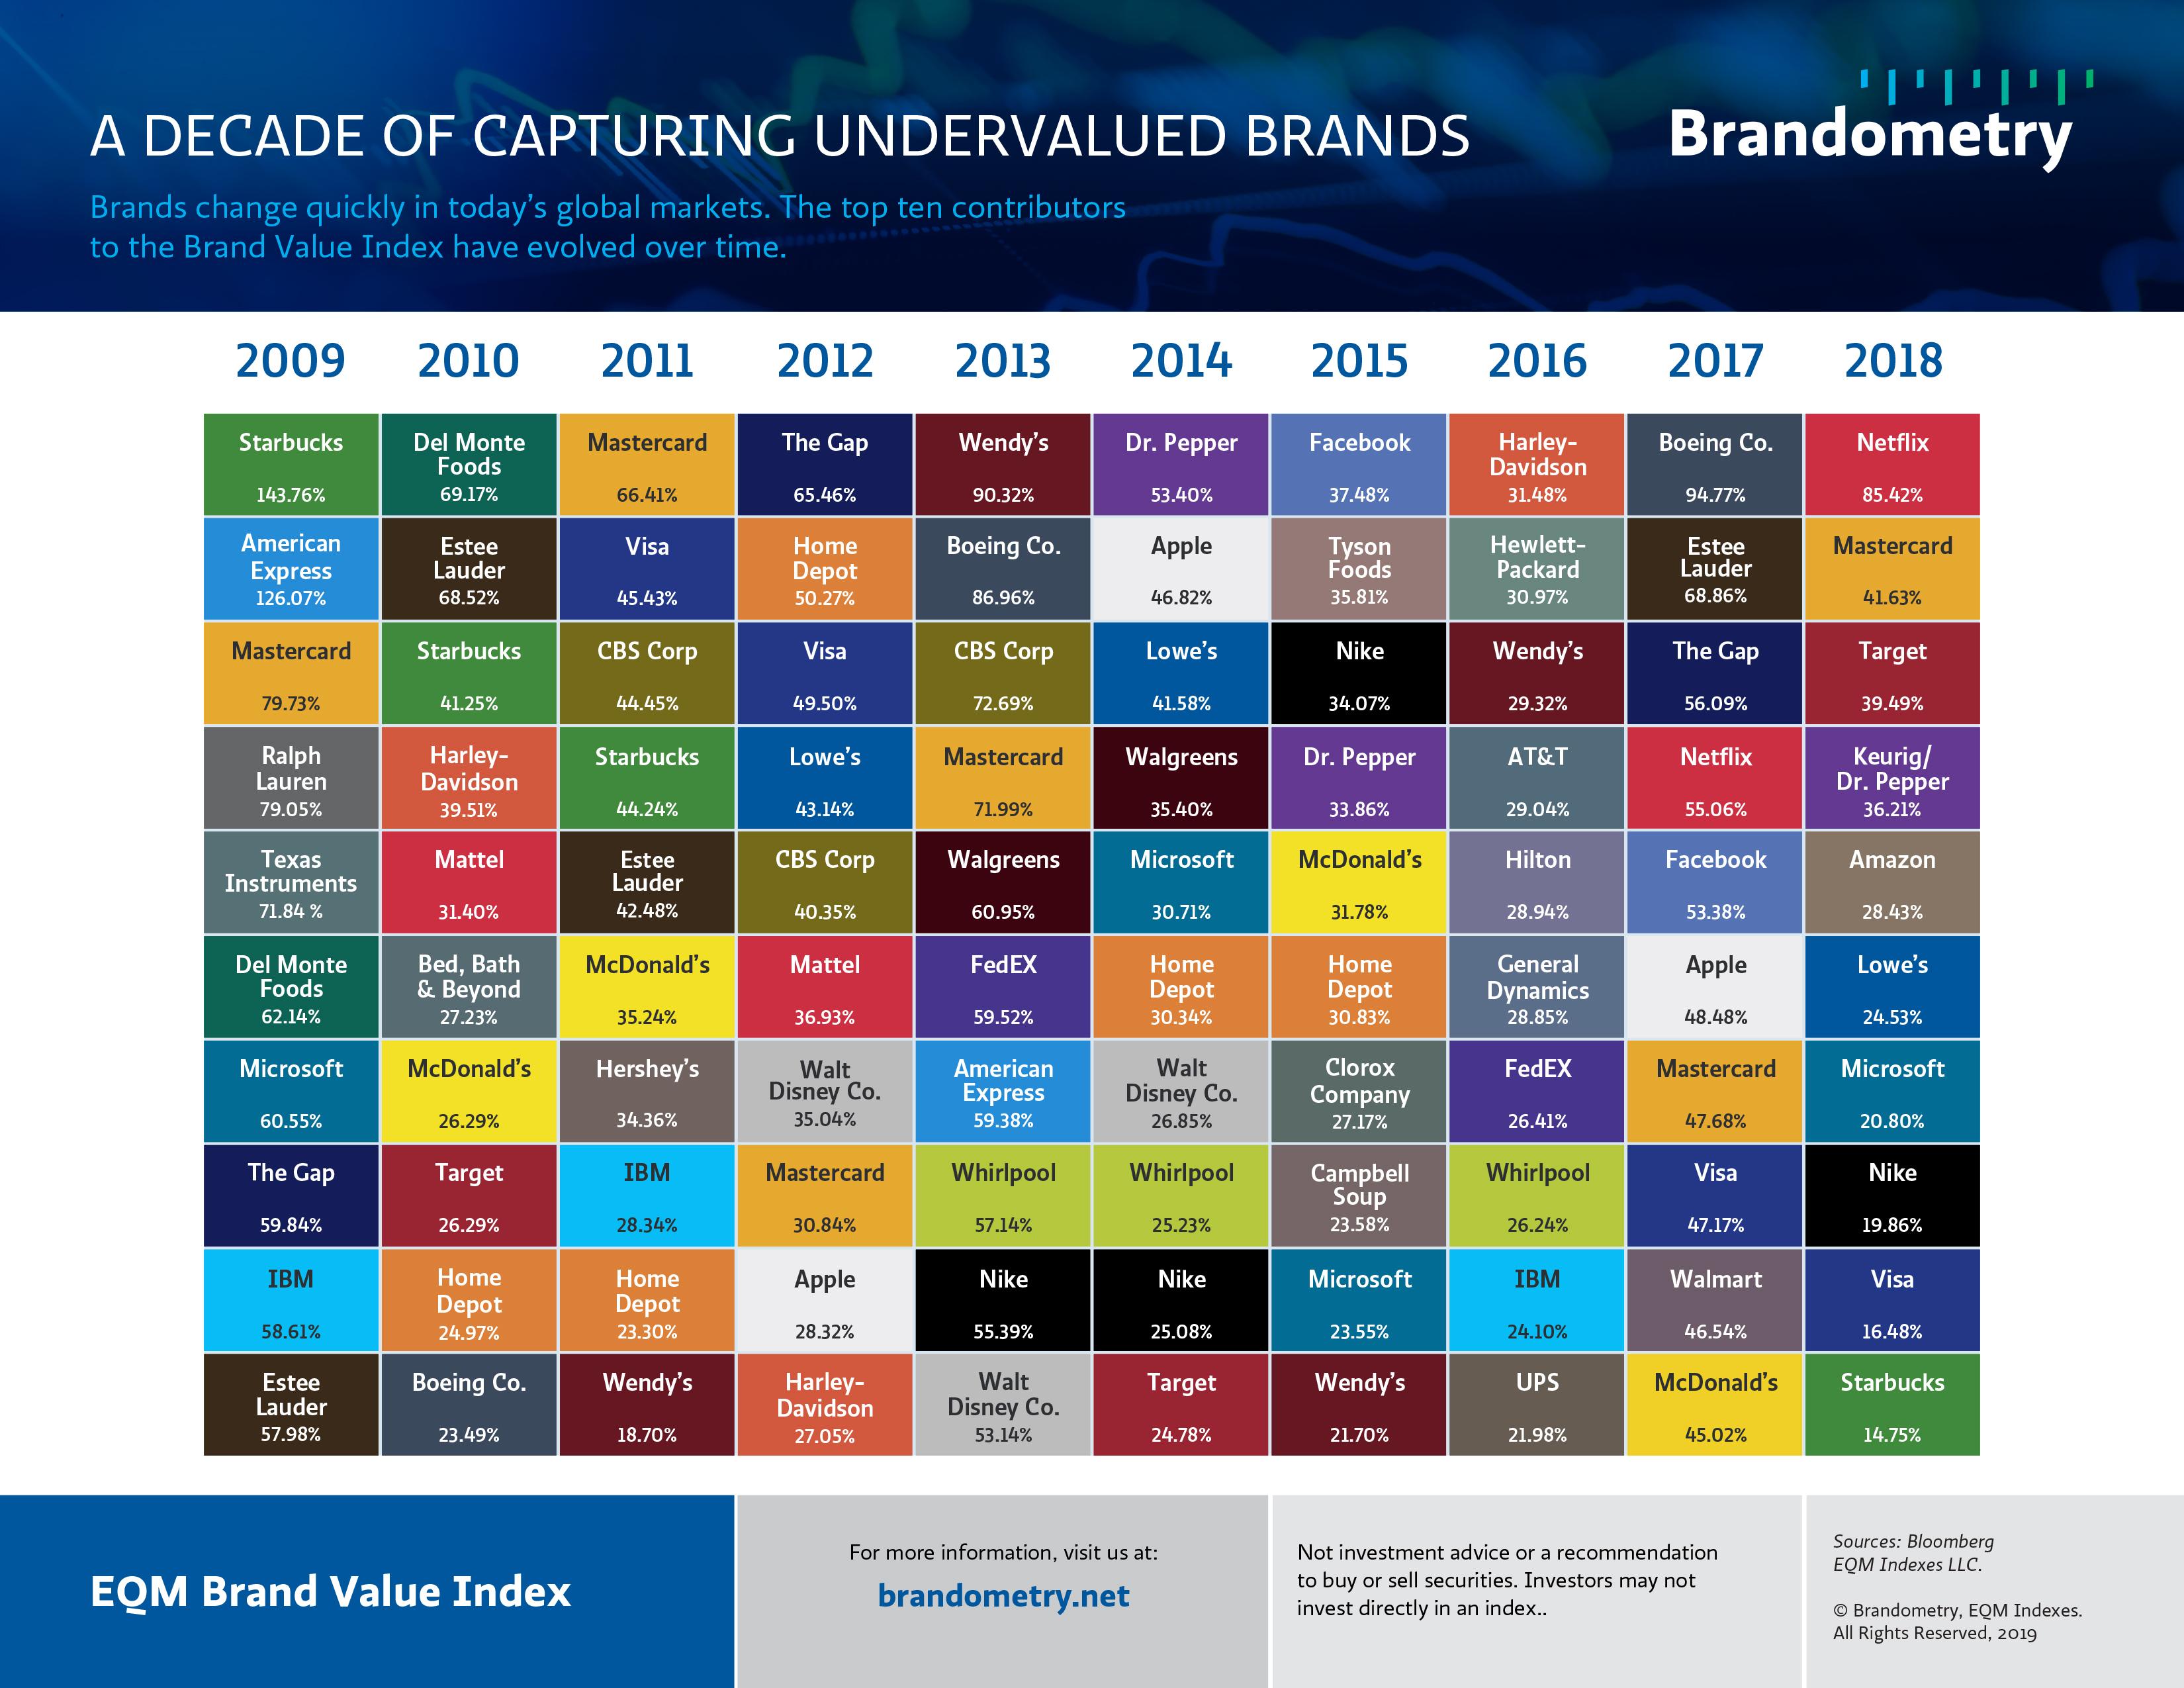 Brandometry Brand Value Evolution